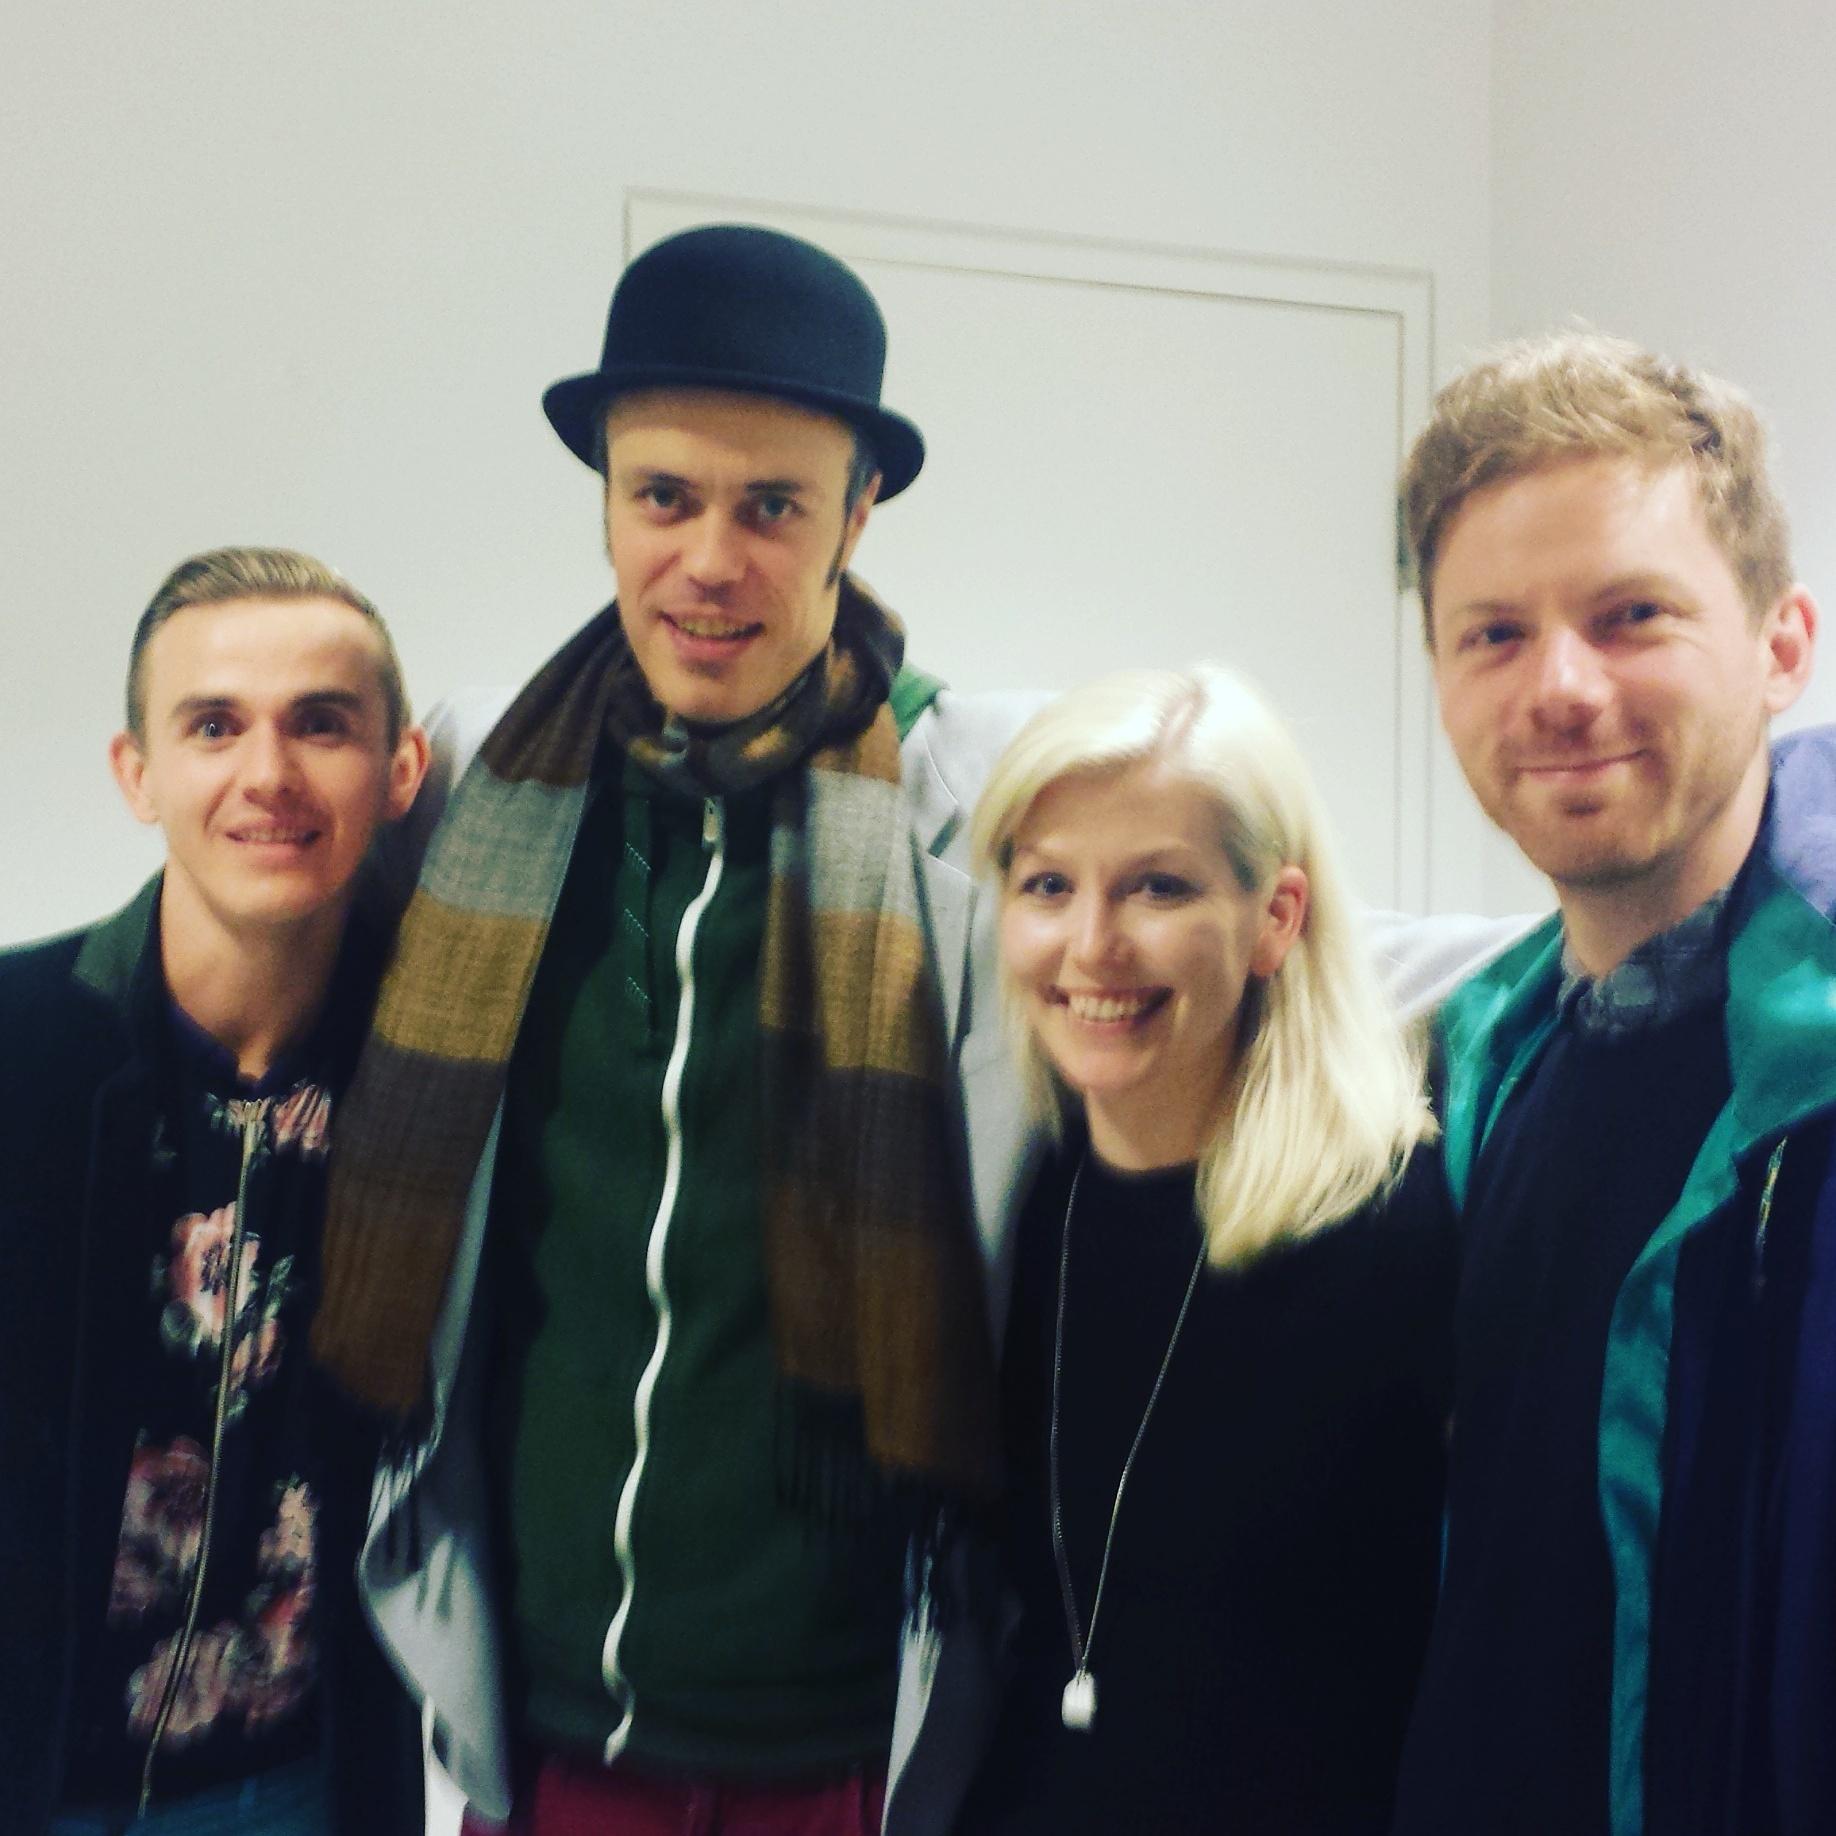 Airwaves Festival Reykjavik, Iceland 2016